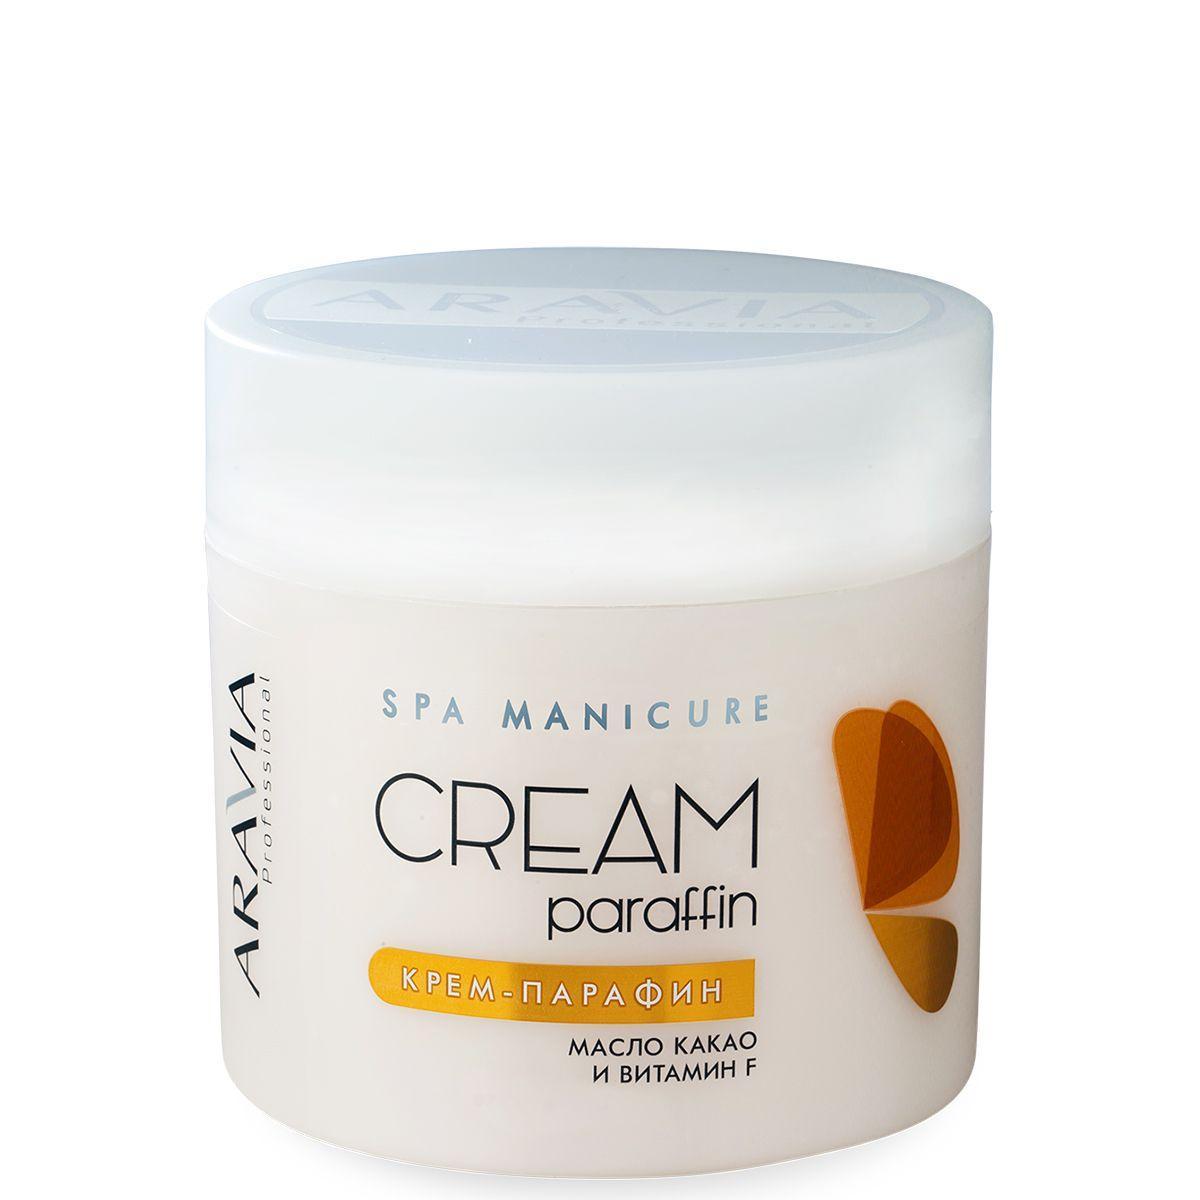 Крем-парафин Creamy Chocolate Aravia Professional  300 мл